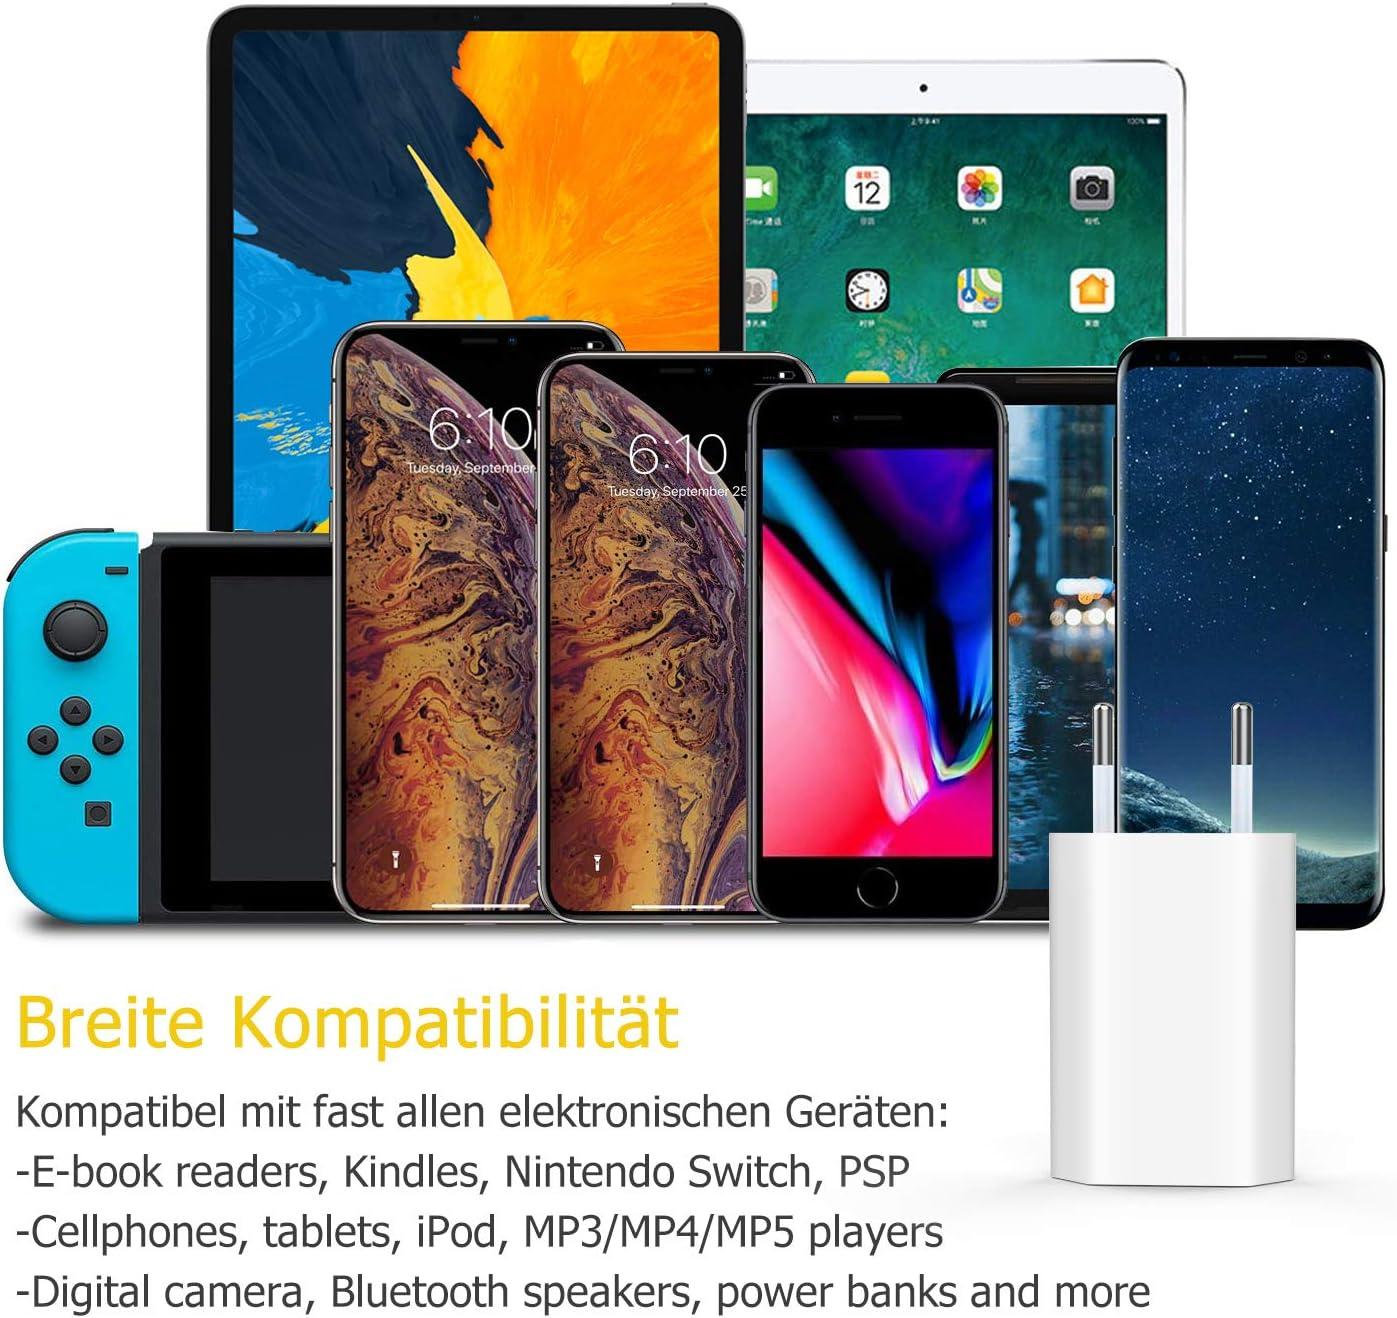 Everdigi USB Ladeger/ät+Ladekabel 1M f/ür Apple Kabel schnell USB Datenkabel//Netzteil//Ladeset f/ür iPhone XS XS Max XR X 8 8 Plus 7 7 Plus 6s 6s Plus 6 6 Plus SE 5s 5c 5 iPad